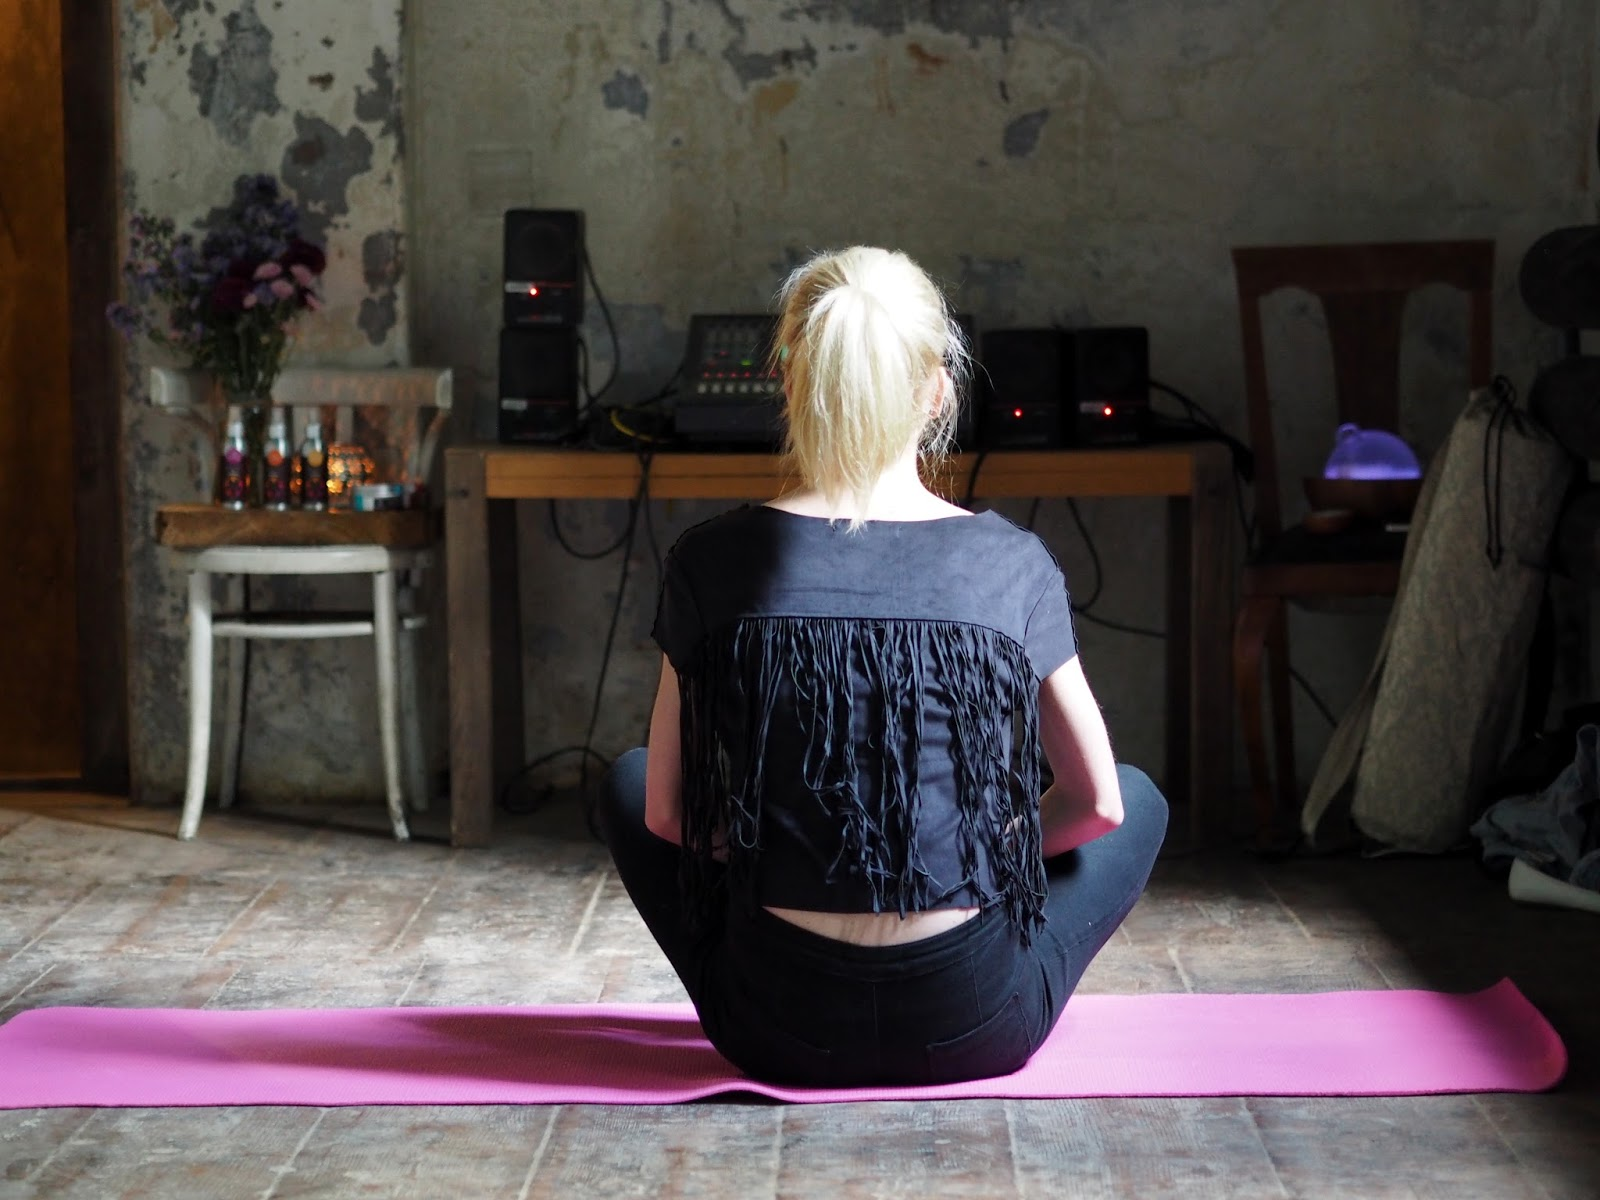 jóga praha lekce kavárna co hledá jméno